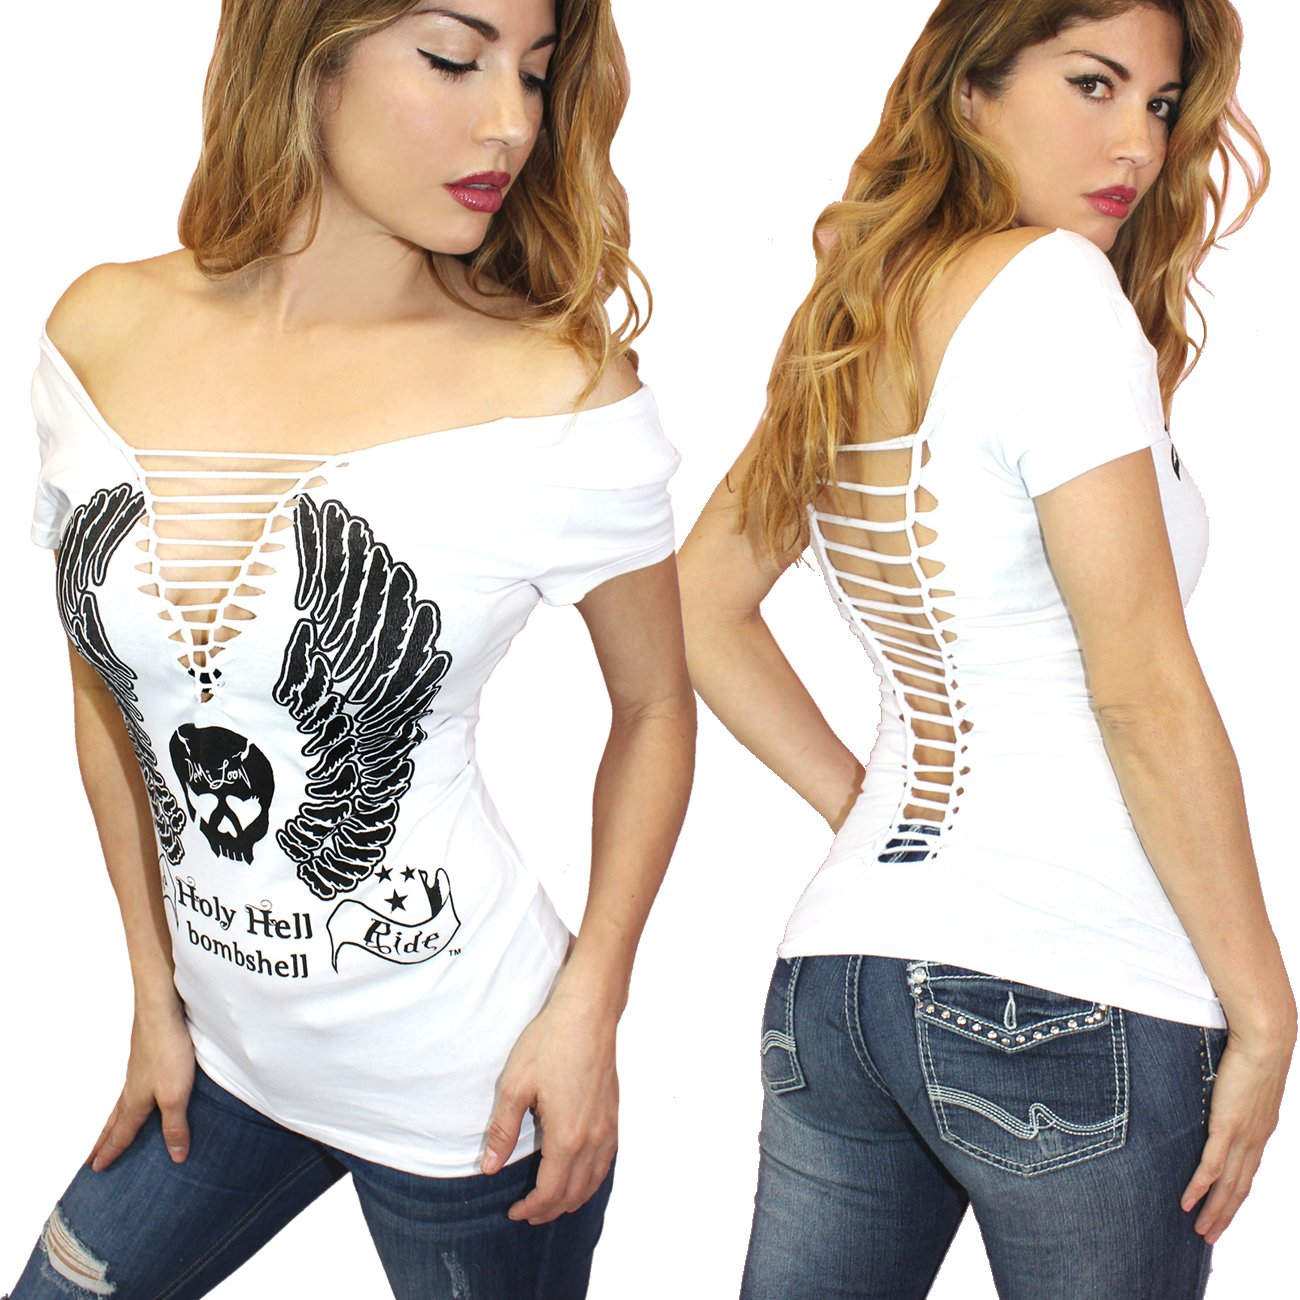 480075da6e65 Amazon.com: Demi Loon Sexy Slashed Cut Out Biker Tee| Graphic Women's  Motorcycle T-Shirt: Clothing